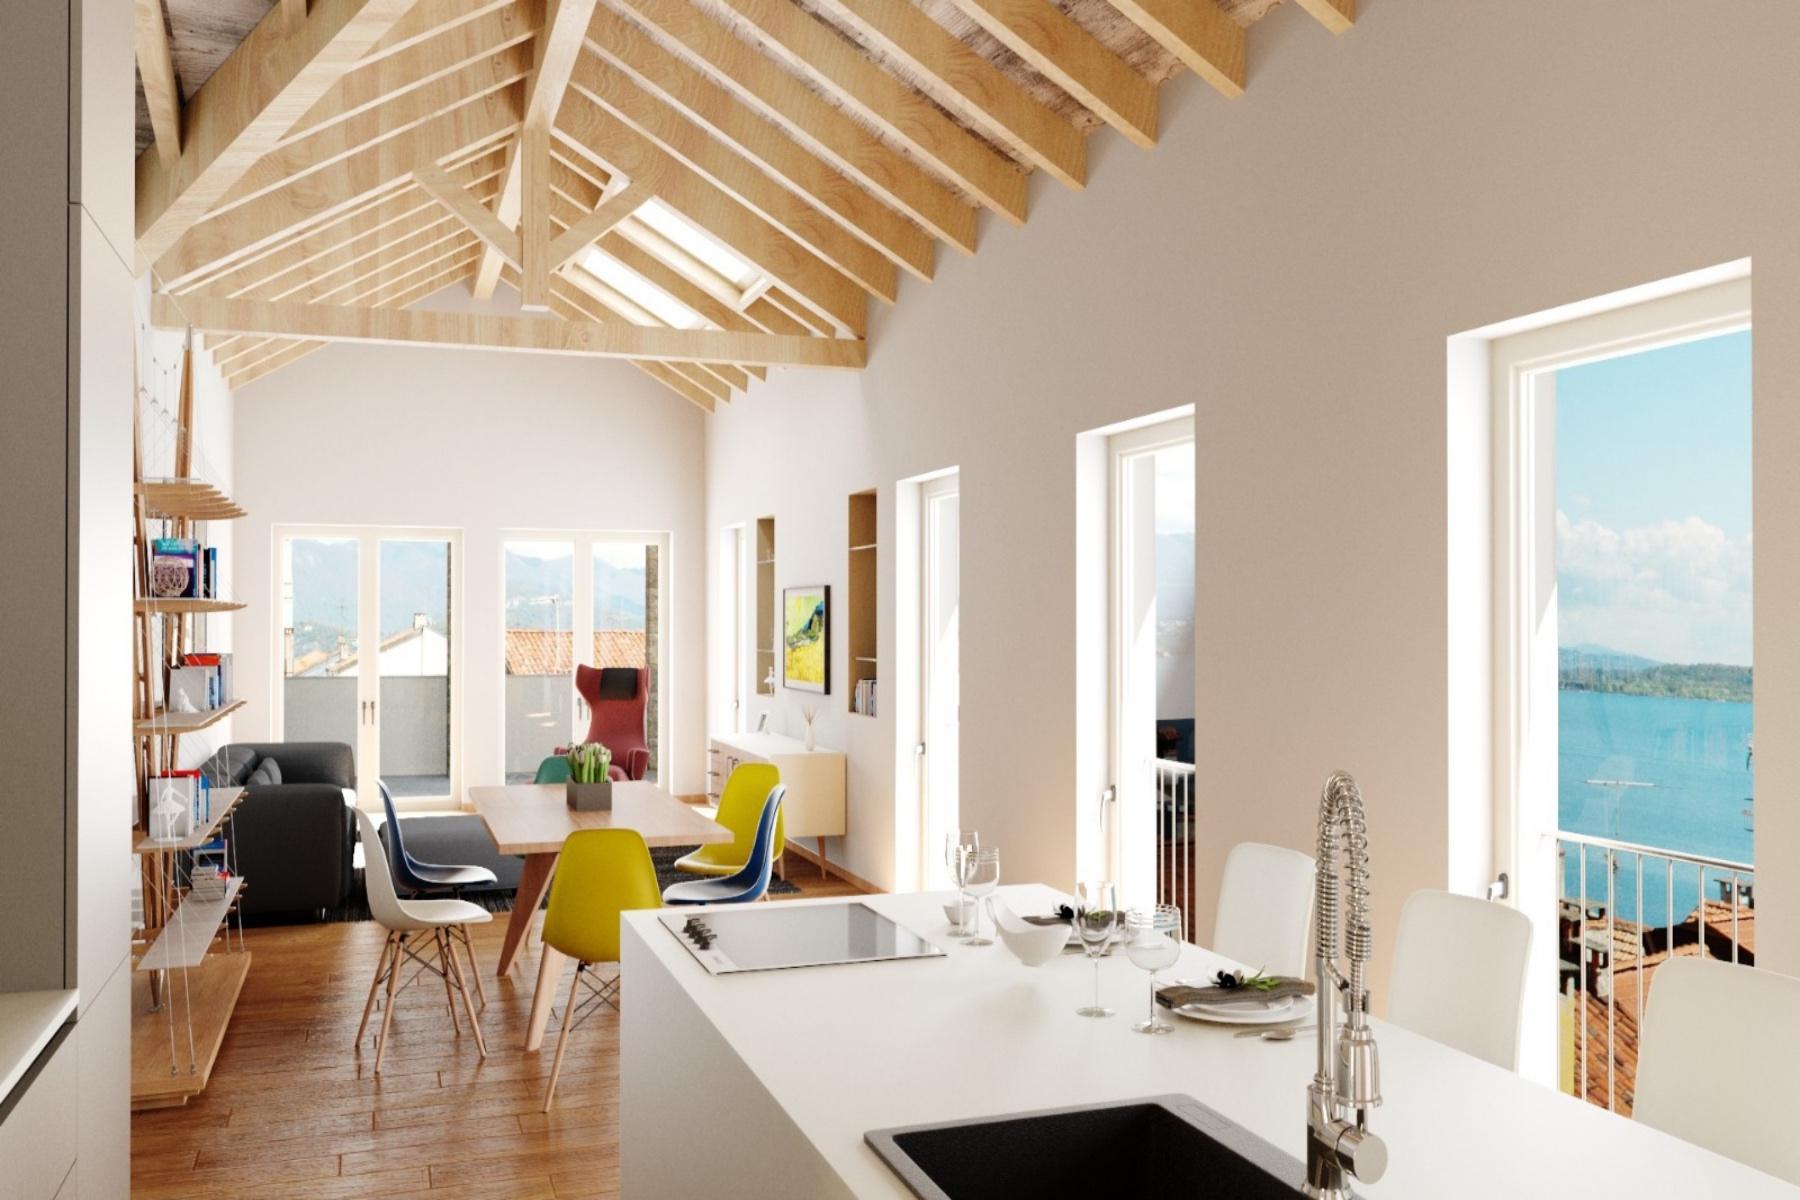 Appartamento in Vendita a Belgirate: 5 locali, 160 mq